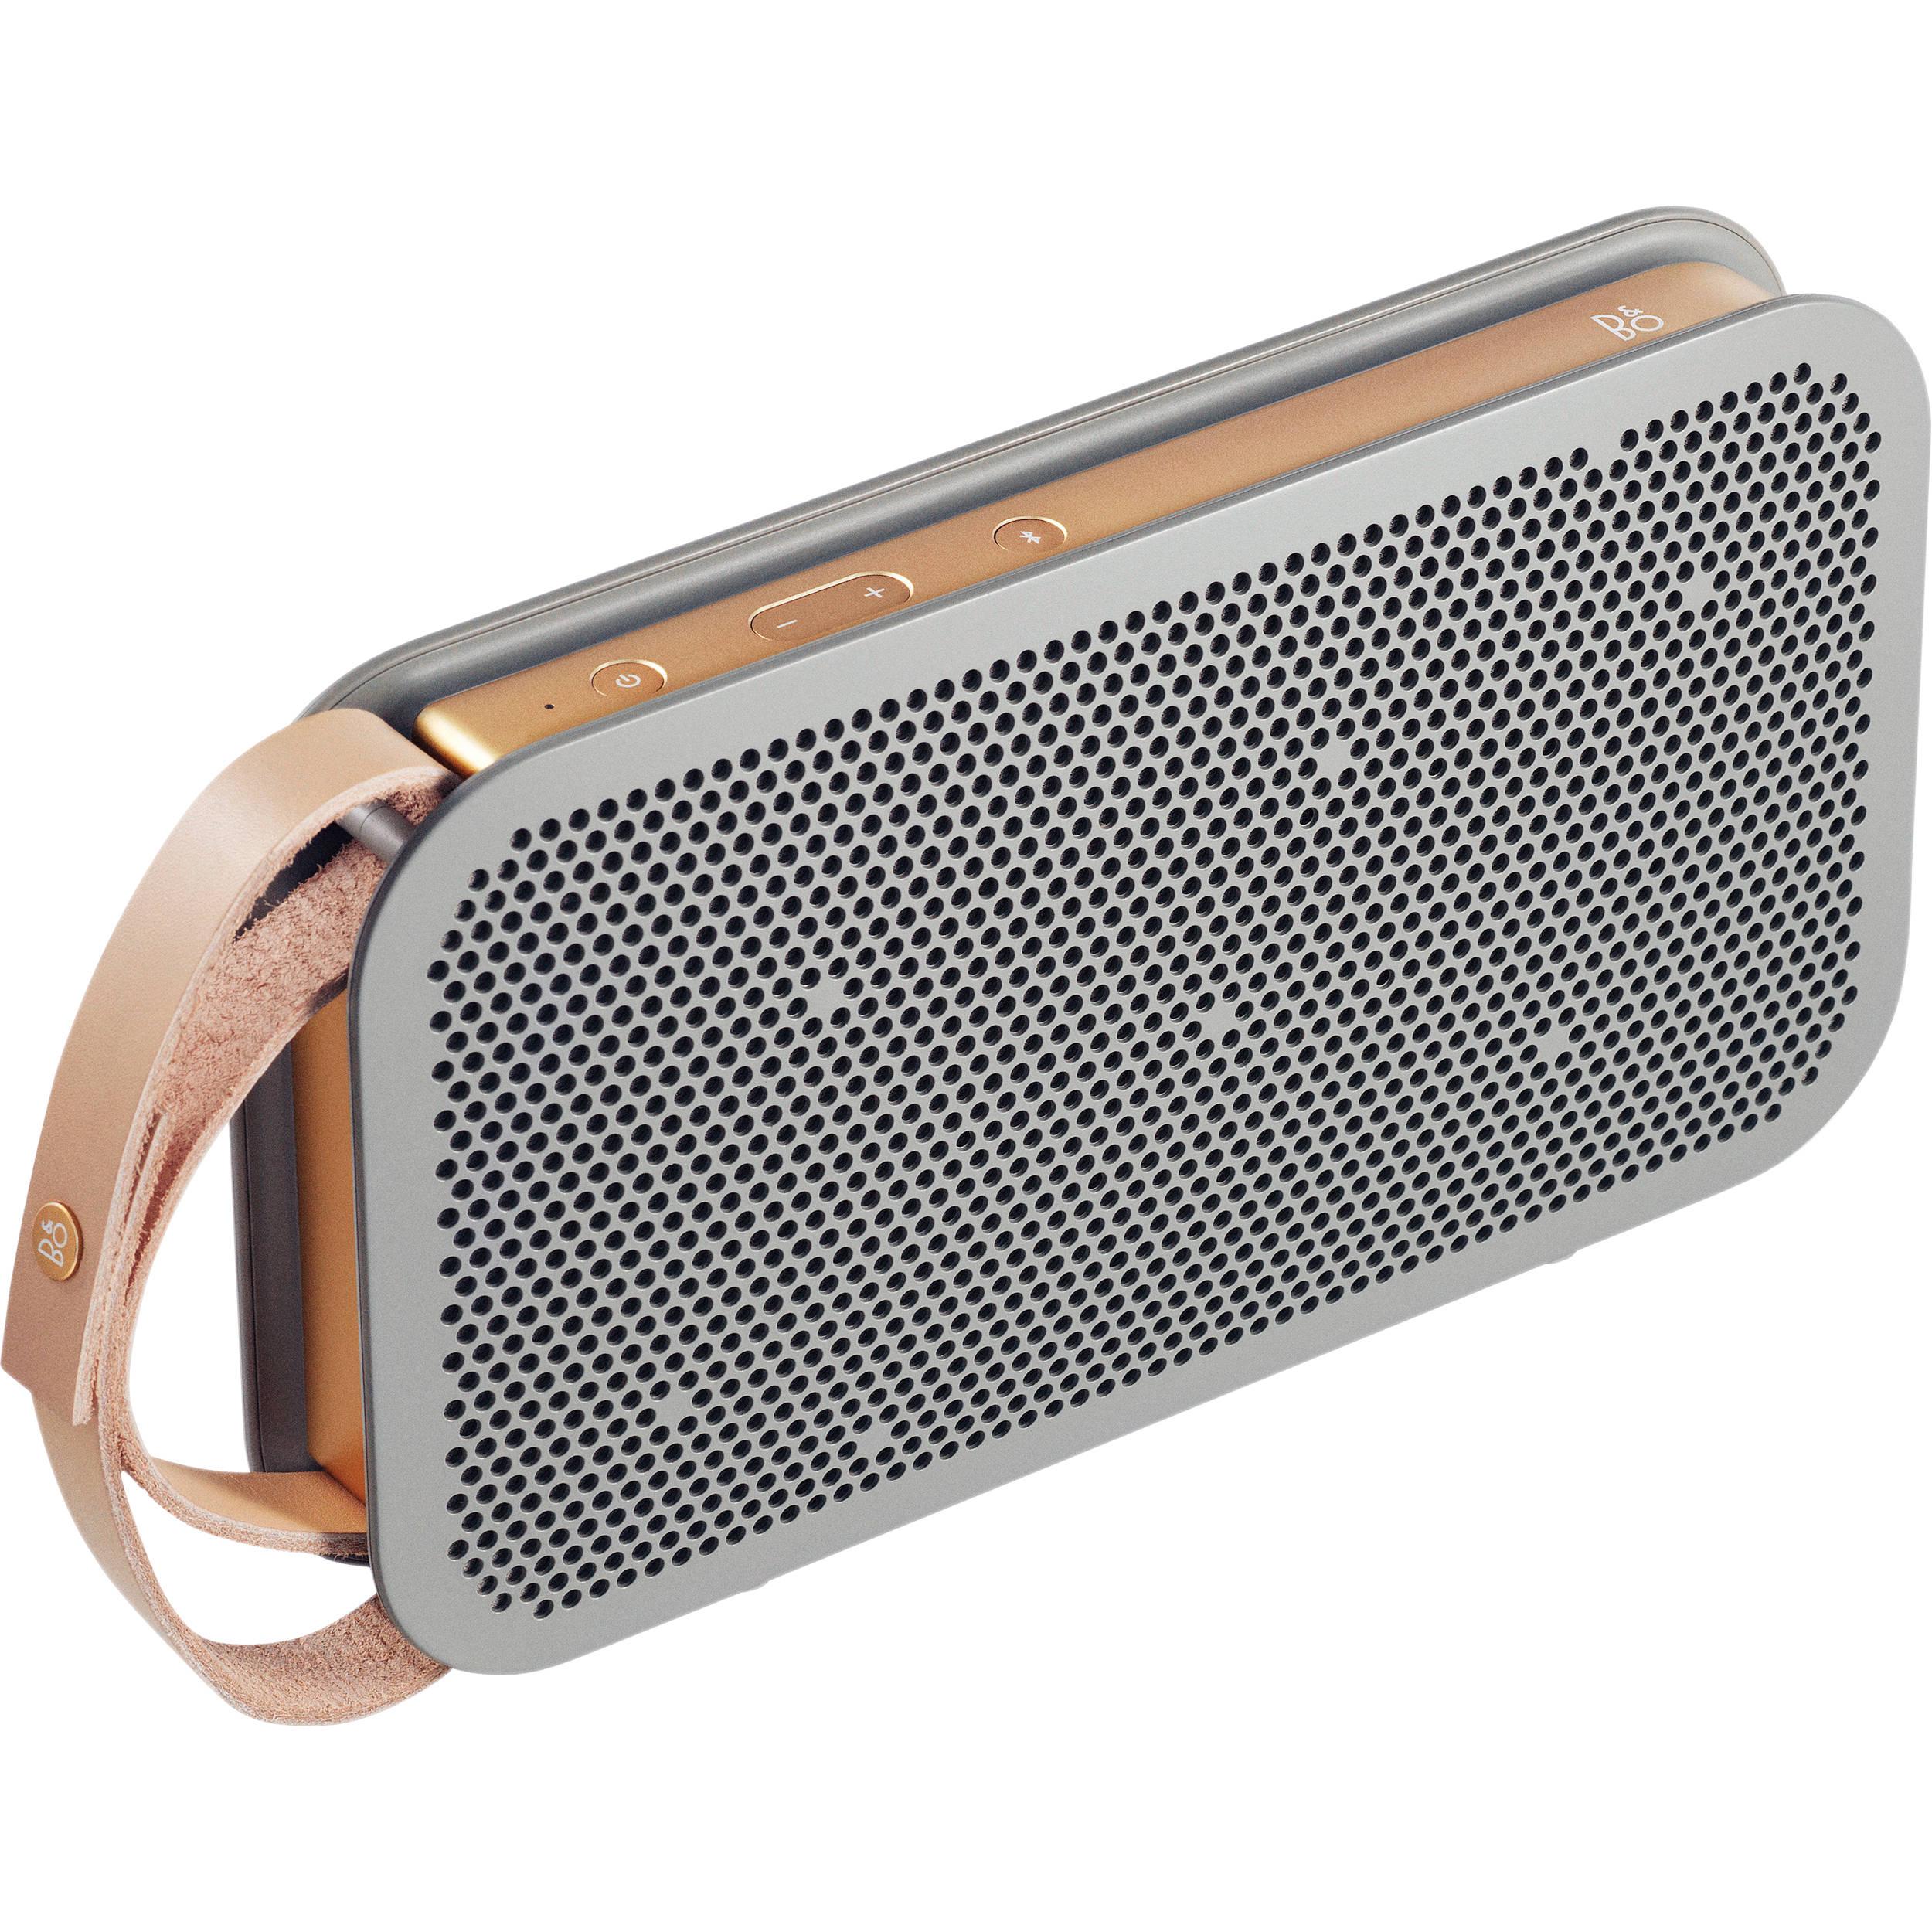 b o play b o play a2 bluetooth speaker gray 1290935